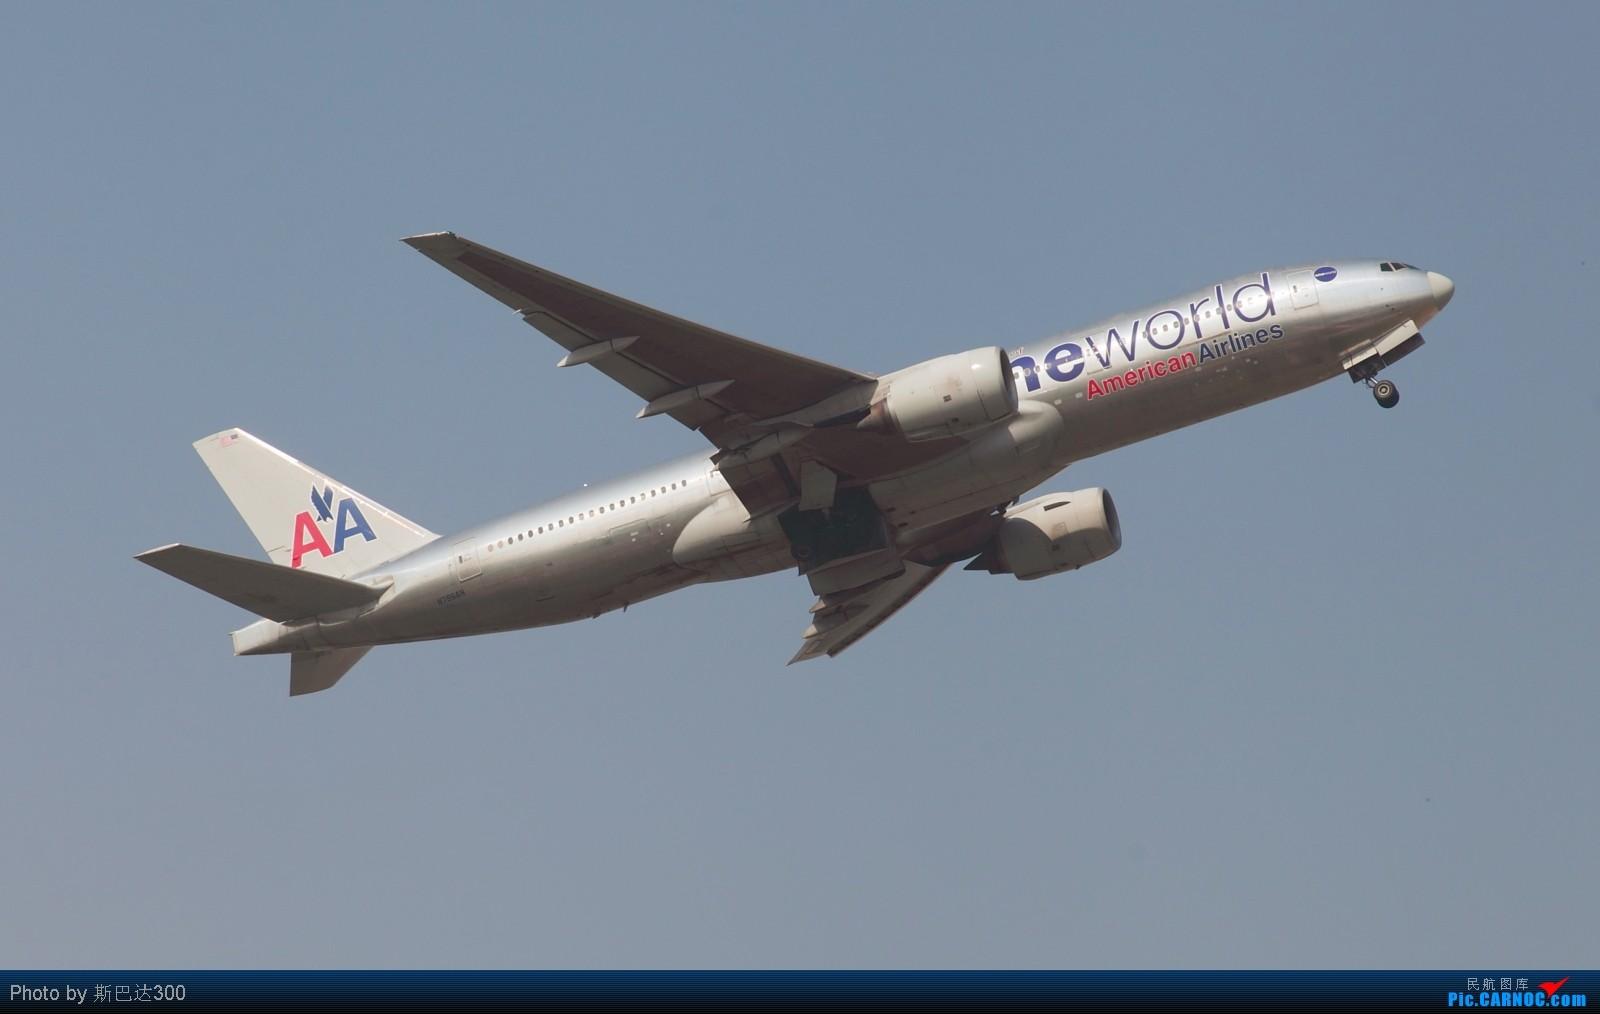 Re:[原创]今天的小收获,全部1600大图献上 BOEING 777-223/ER N796AN 中国北京首都机场